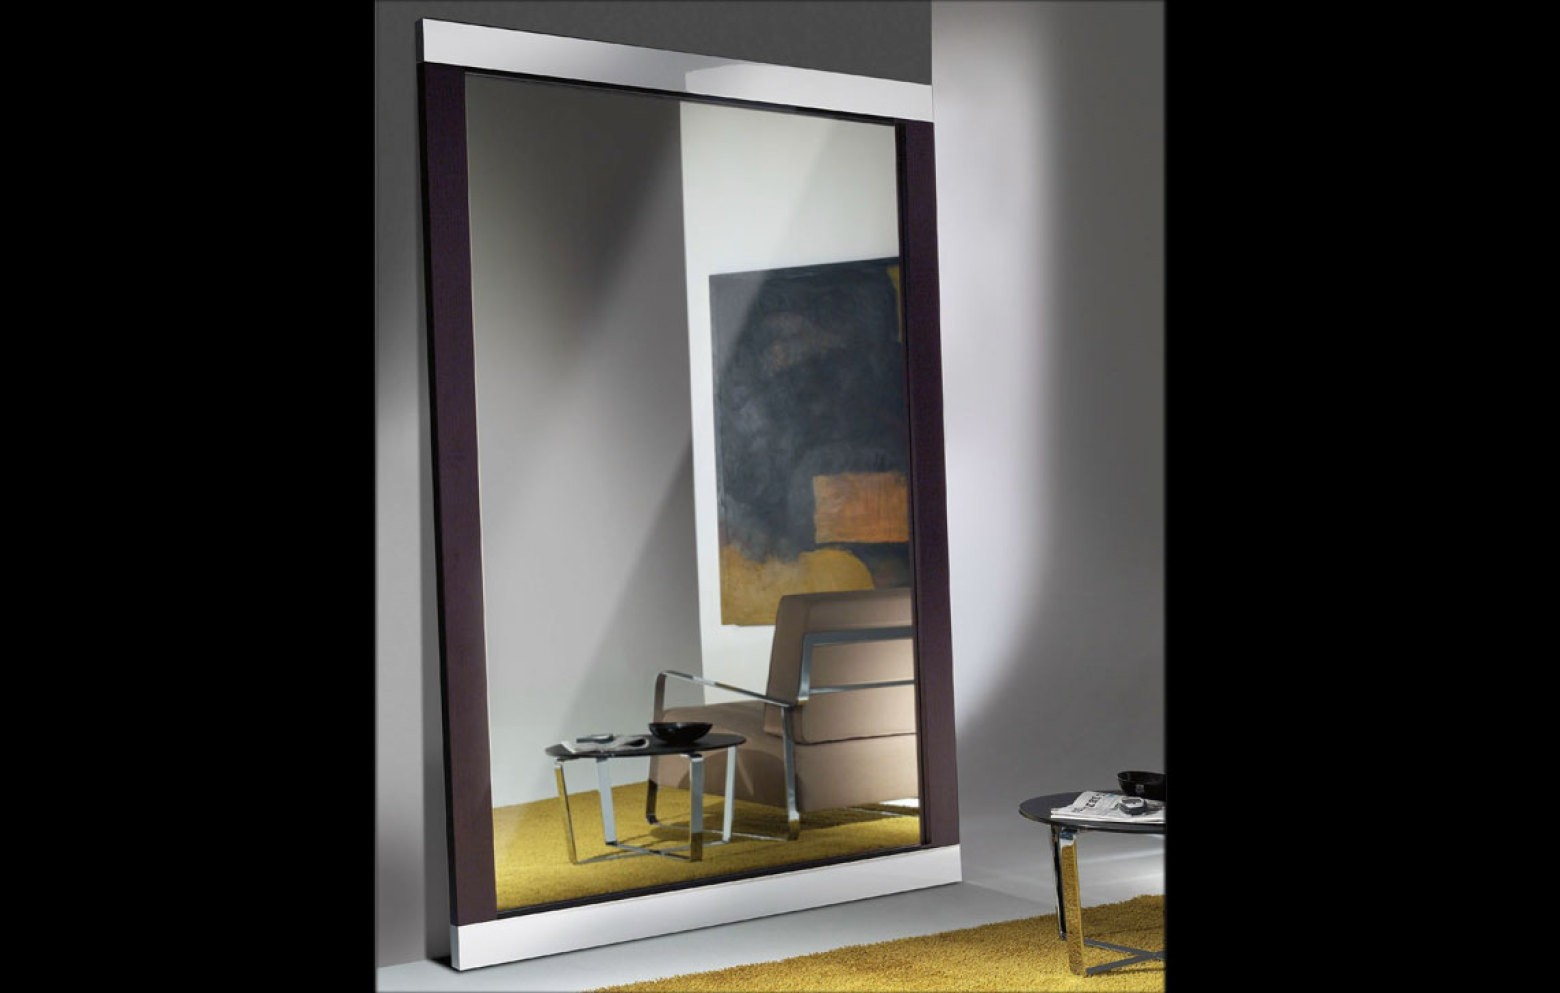 hadaka spiegel kleinm bel accessoires who 39 s perfect. Black Bedroom Furniture Sets. Home Design Ideas